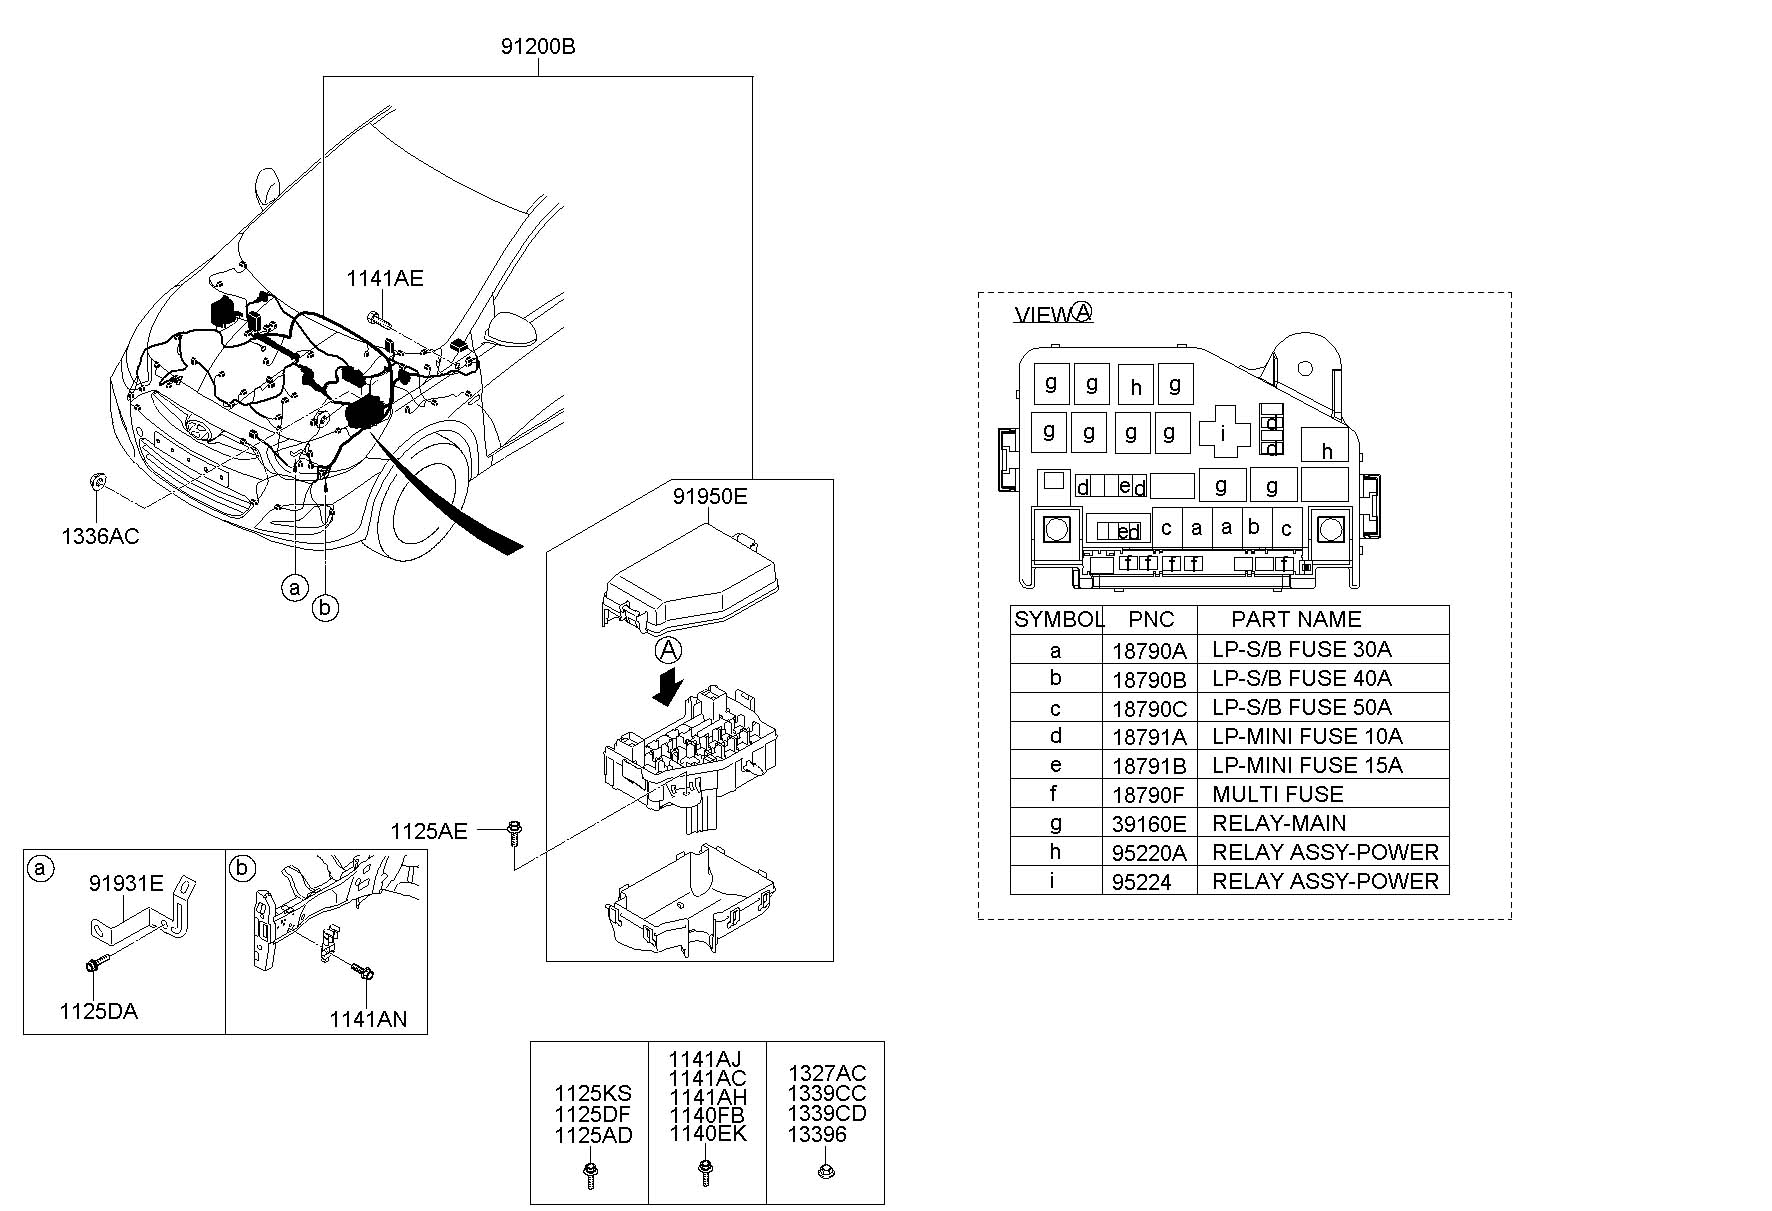 Hyundai Elantra Radio Wiring Diagram Pics